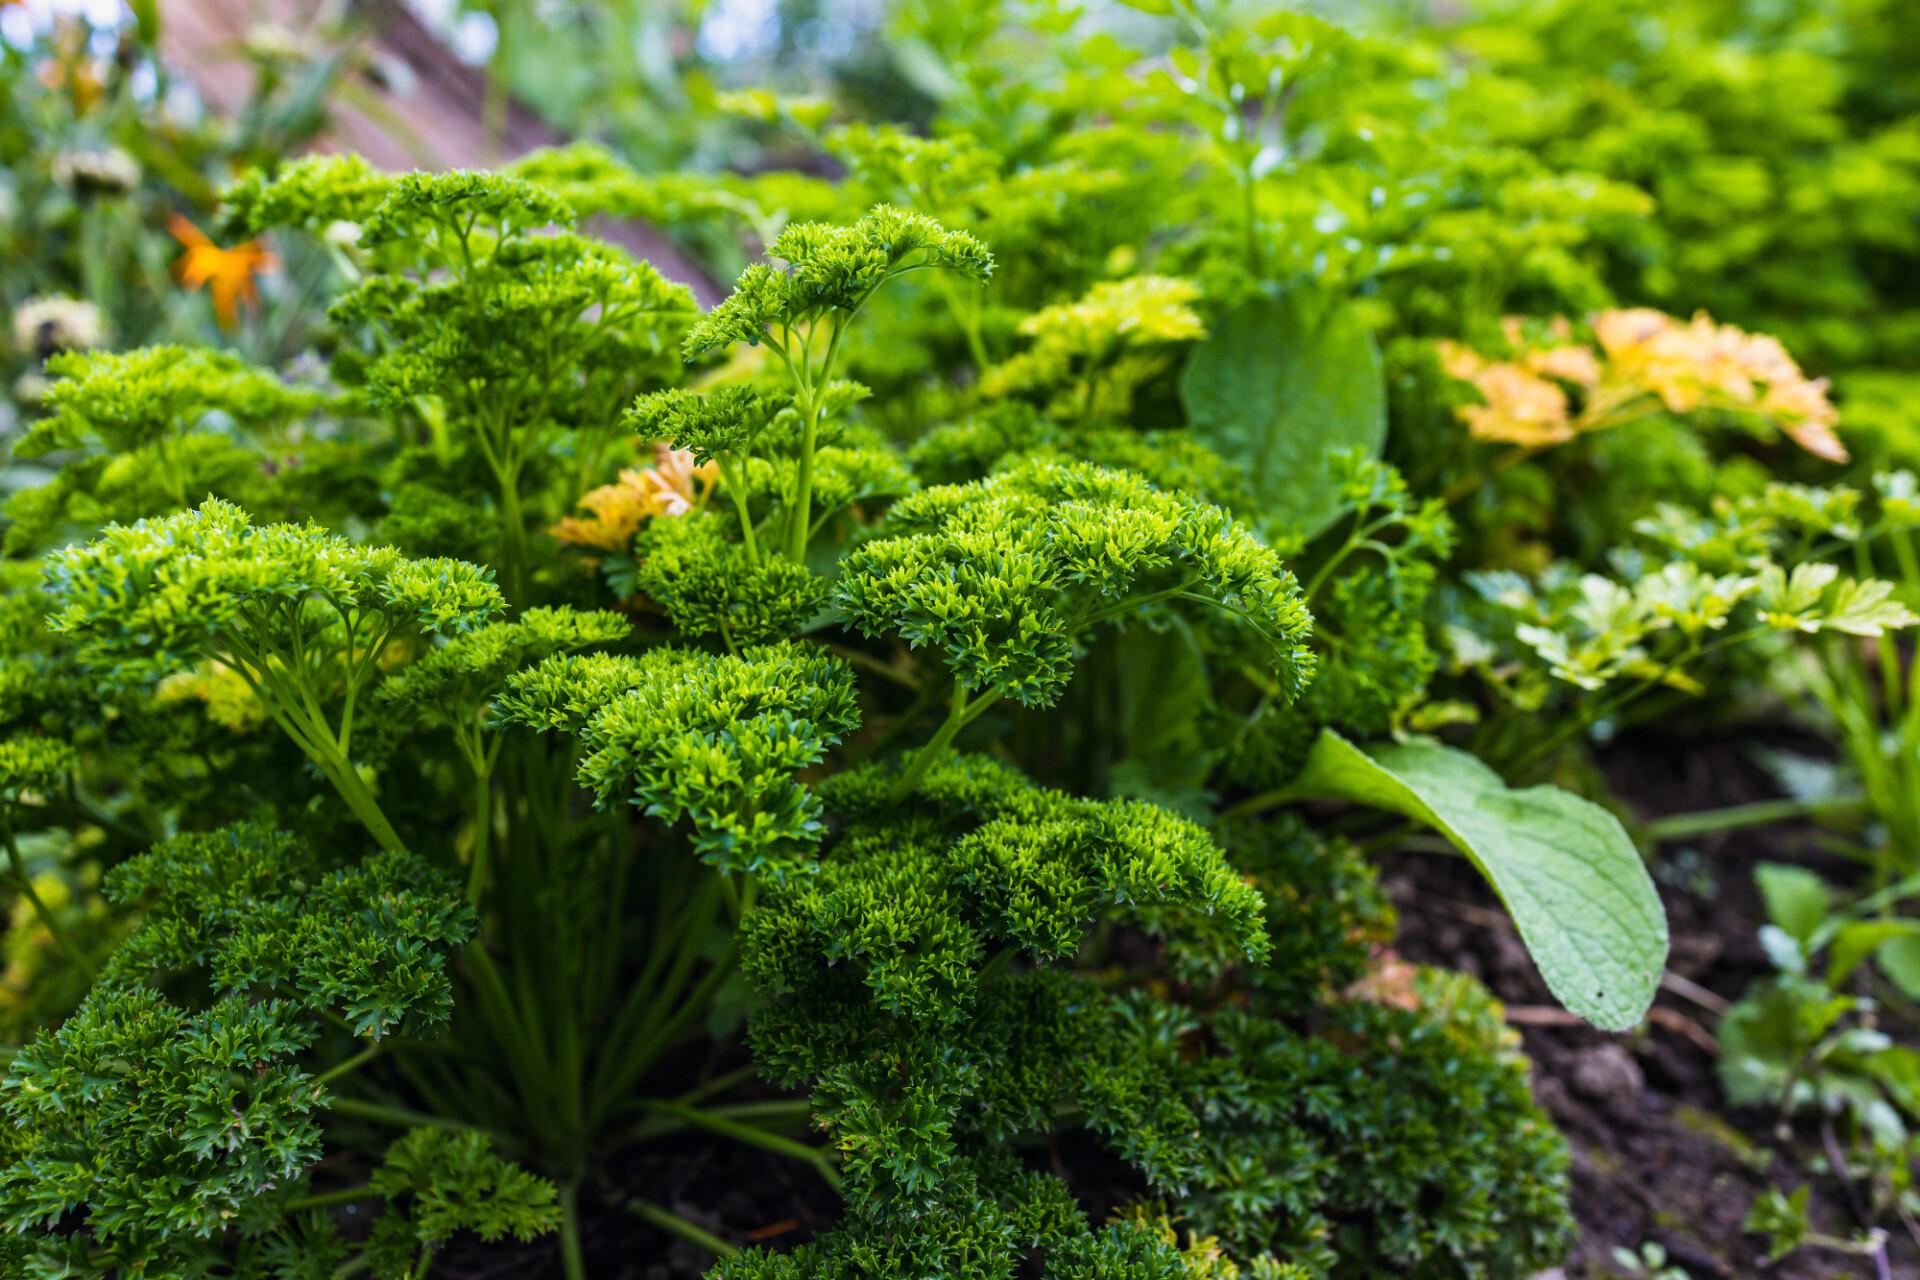 Parsley in the herb garden